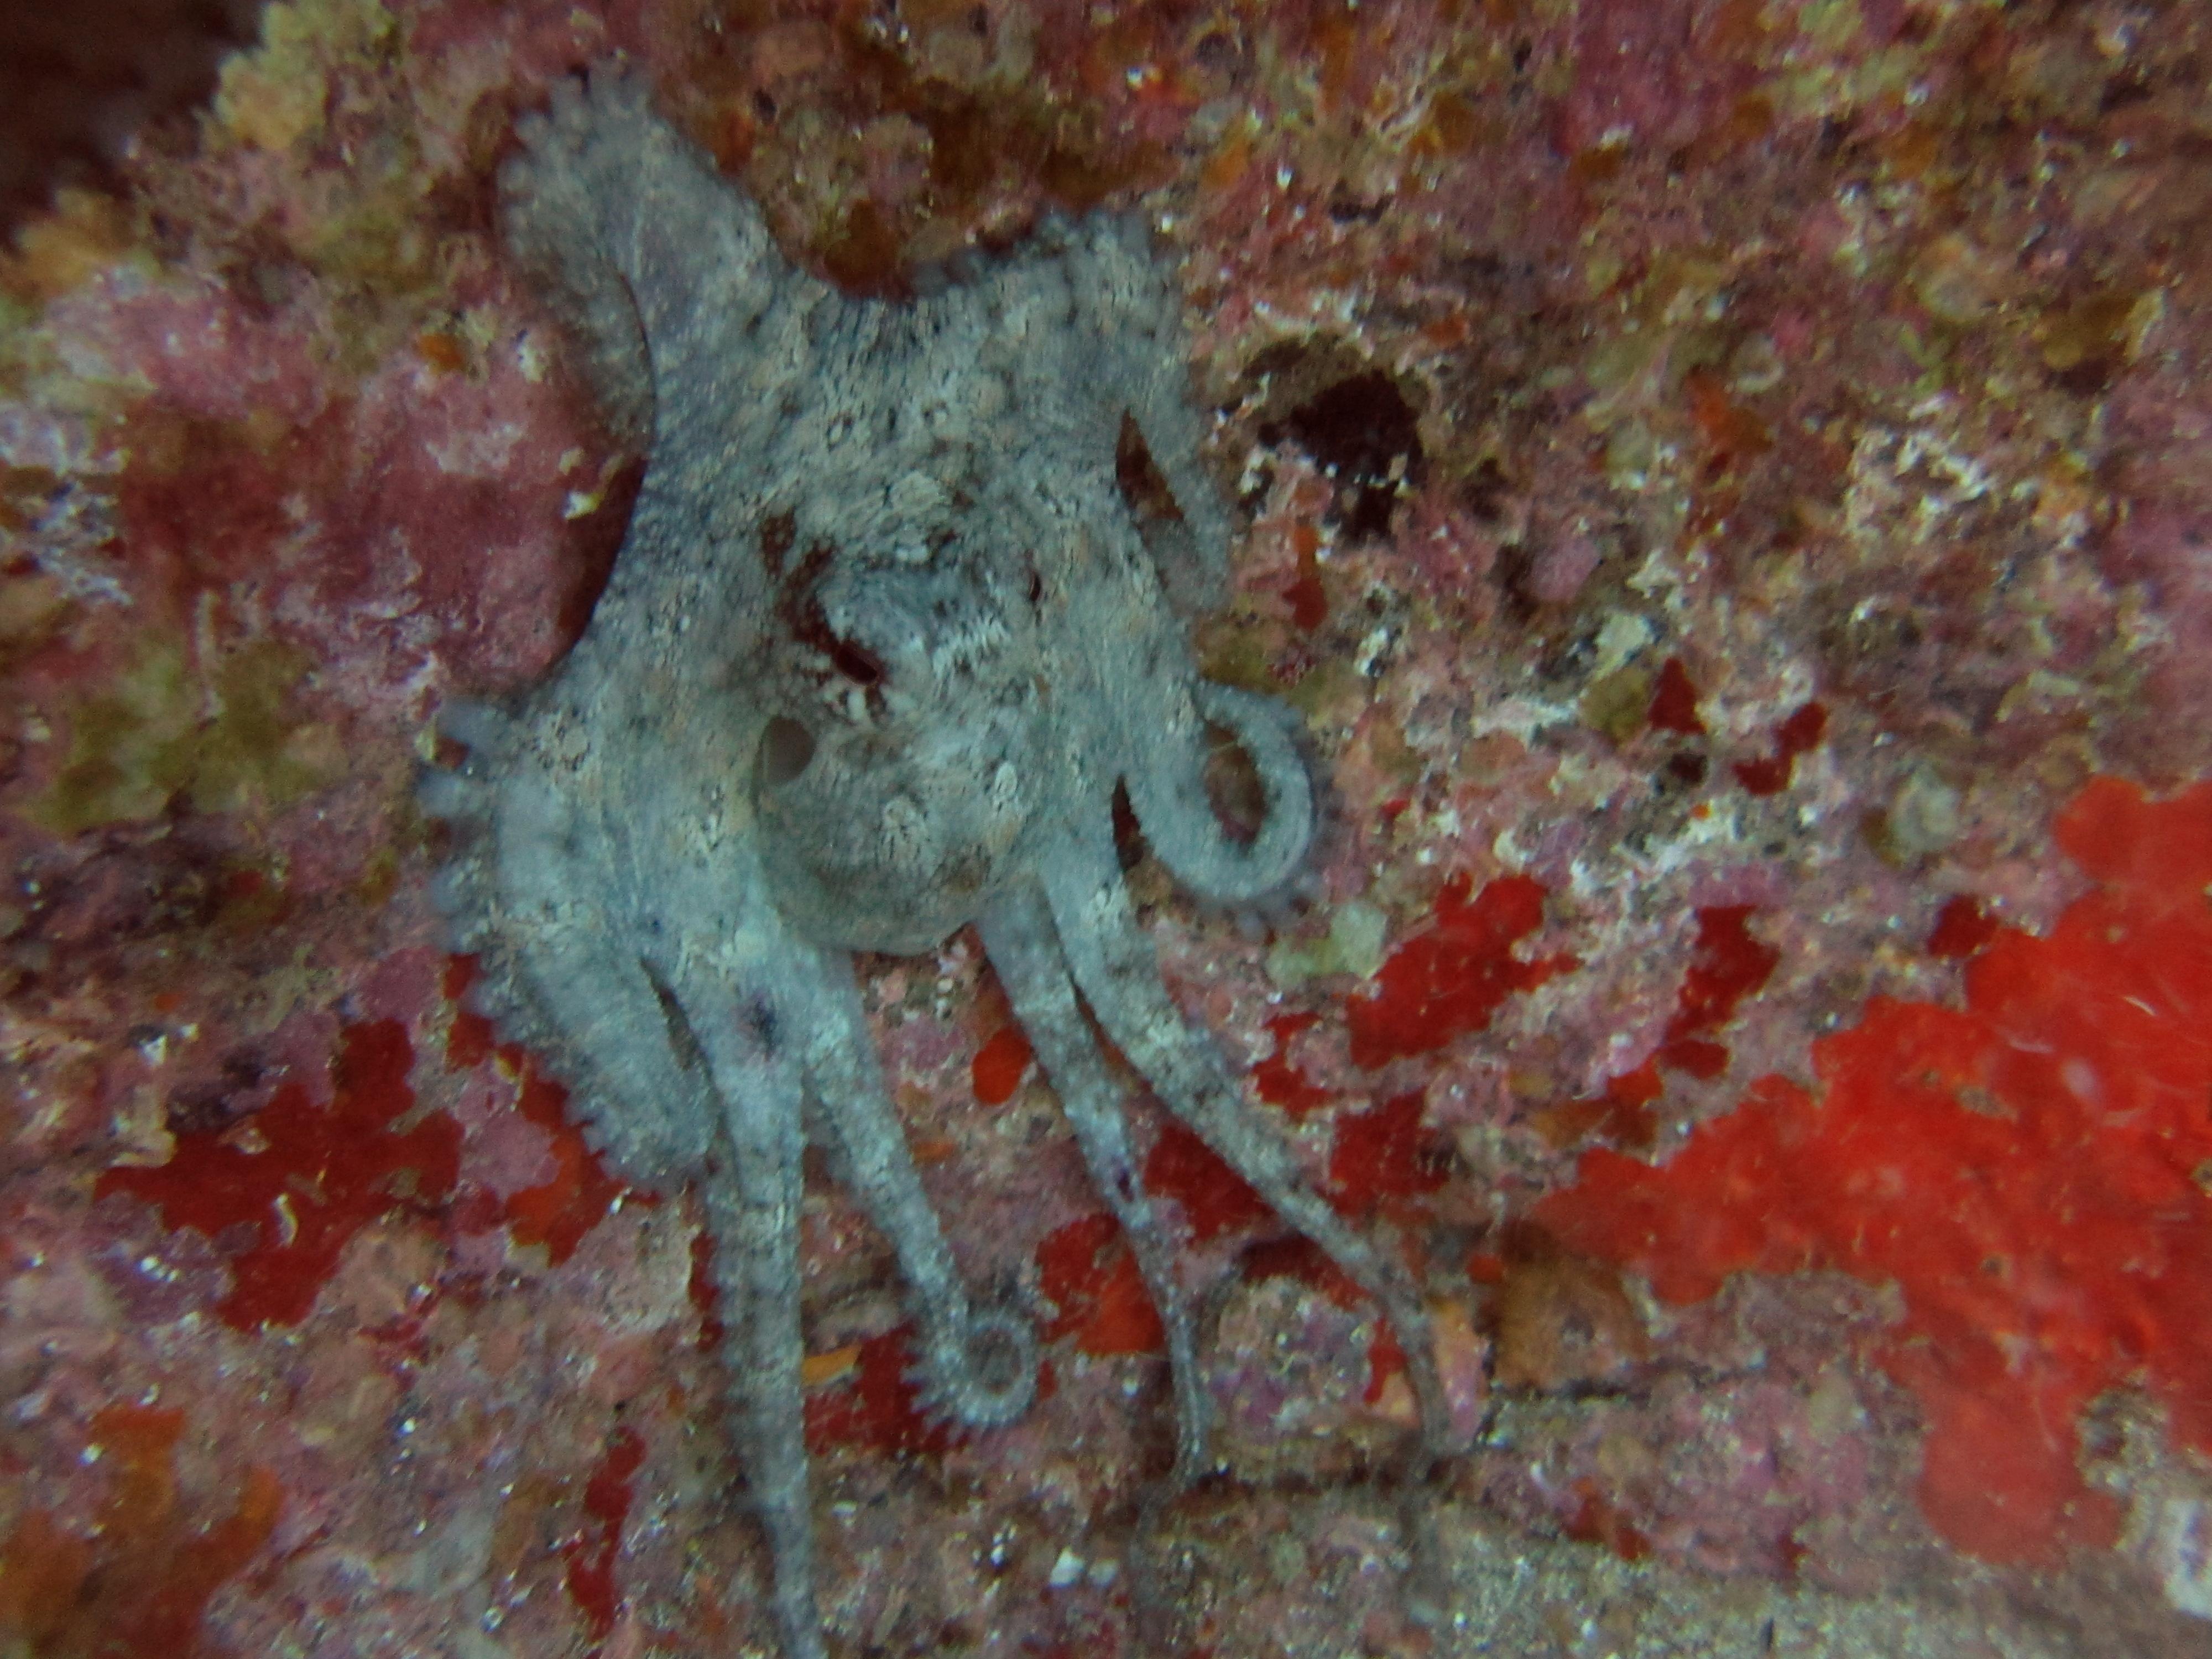 Diving-Tenerife-Aquatic-Life-Sharks-Sting-Rays-Fish (67)